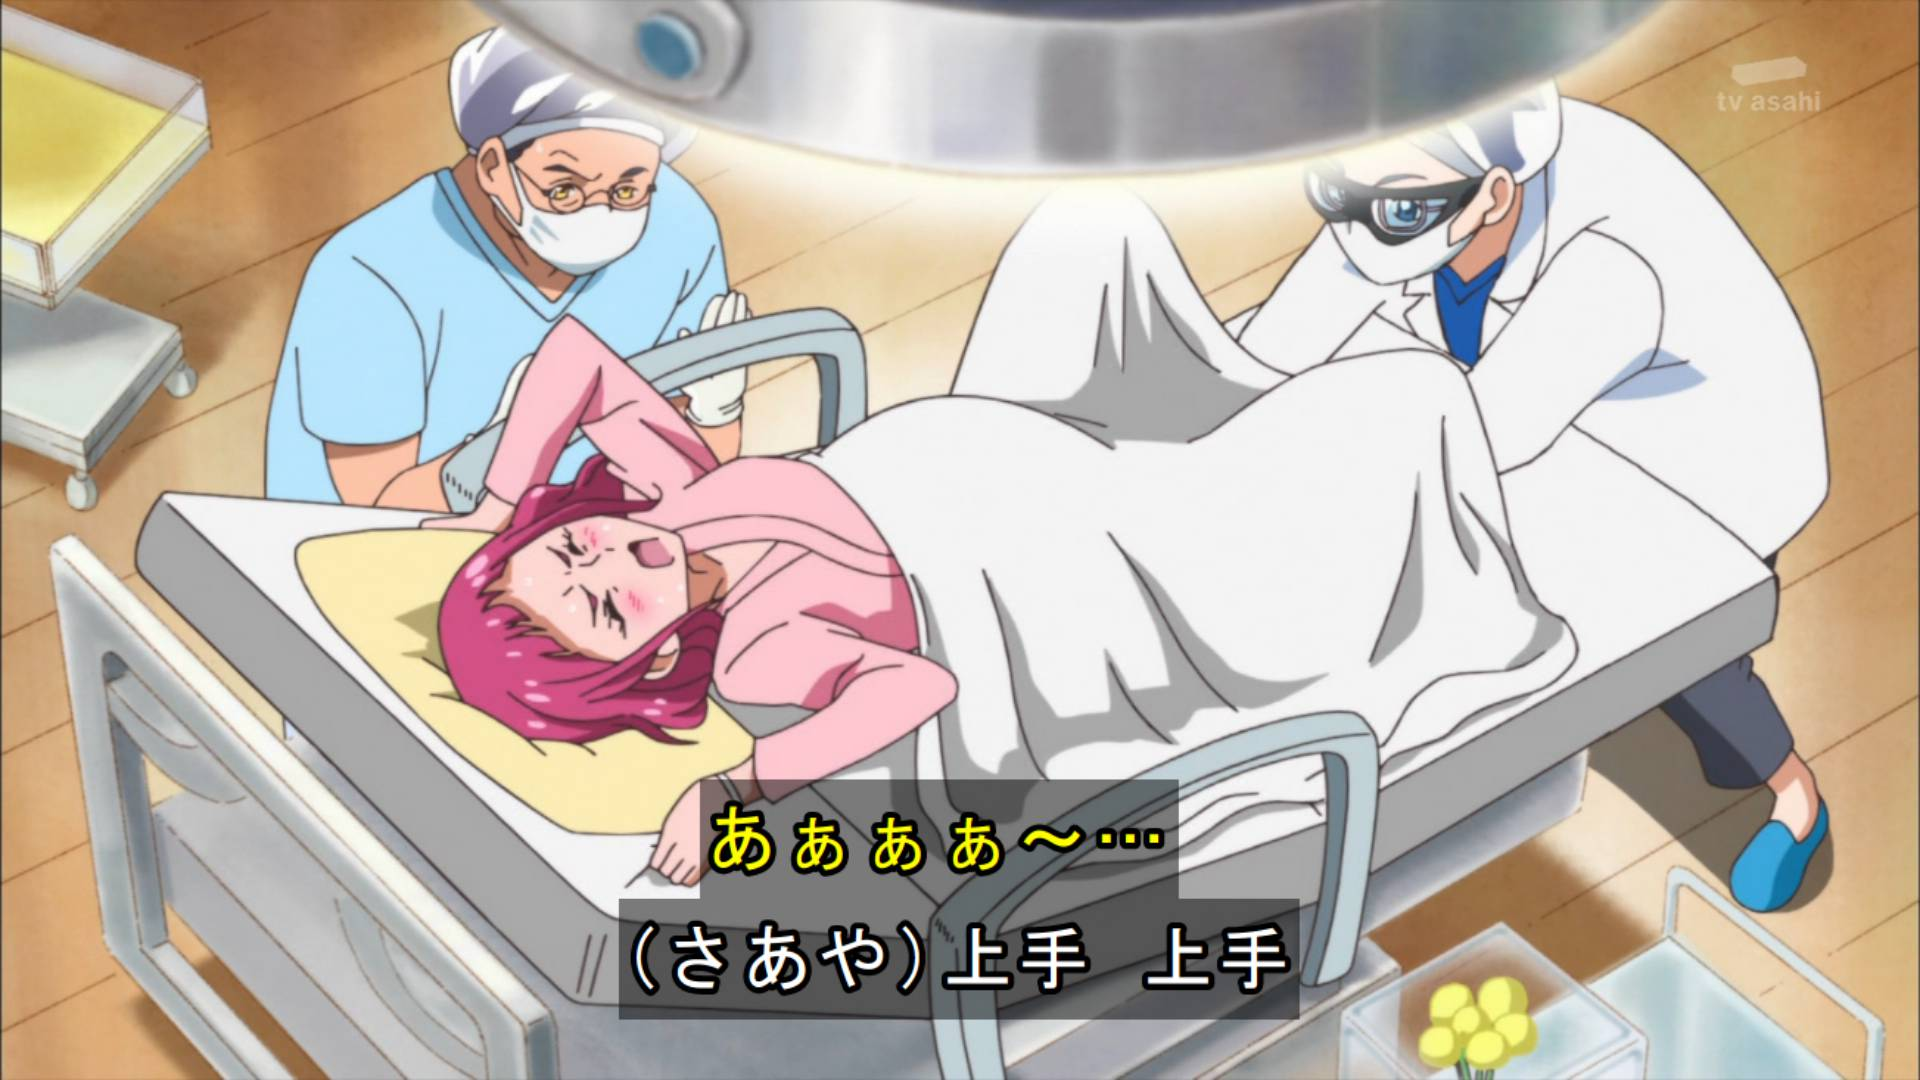 Tvアニメ Hugっと プリキュア 最終回 出産シーン描かれ反響